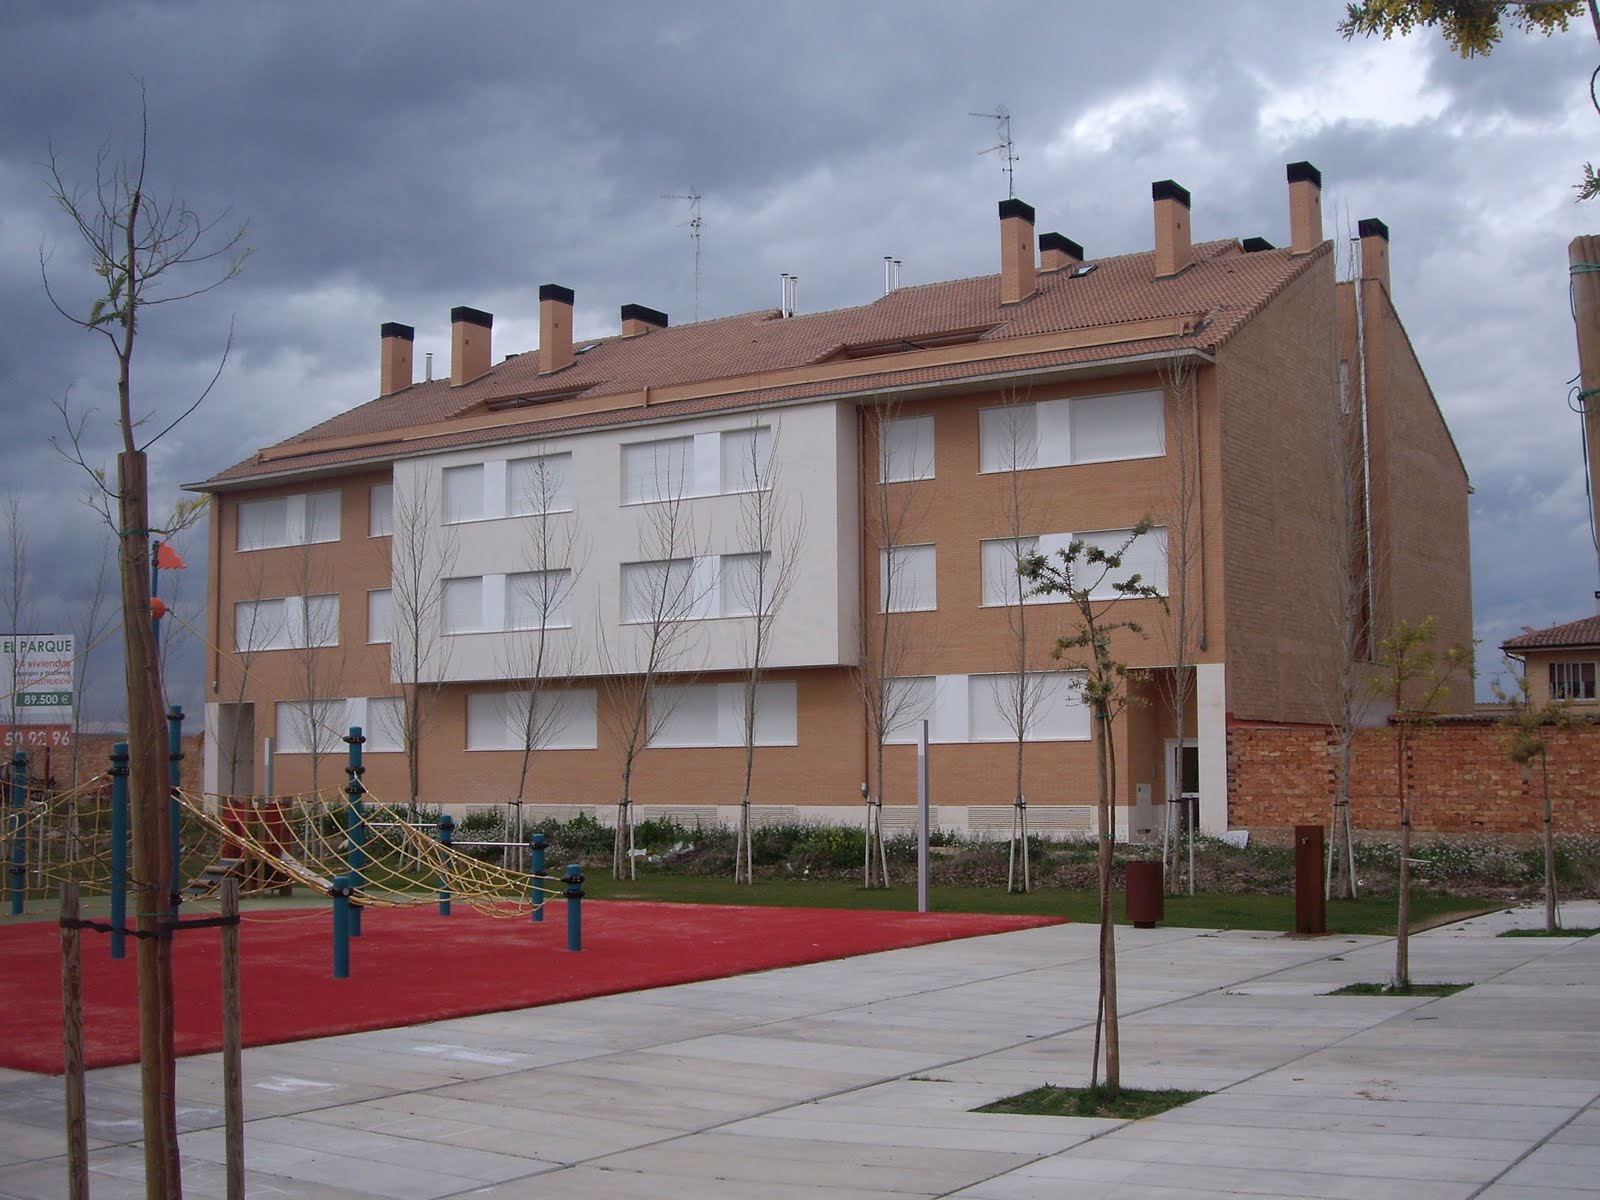 Arquitecto tecnico navarra 24 viviendas en arrubal logro o - Arquitectos navarra ...